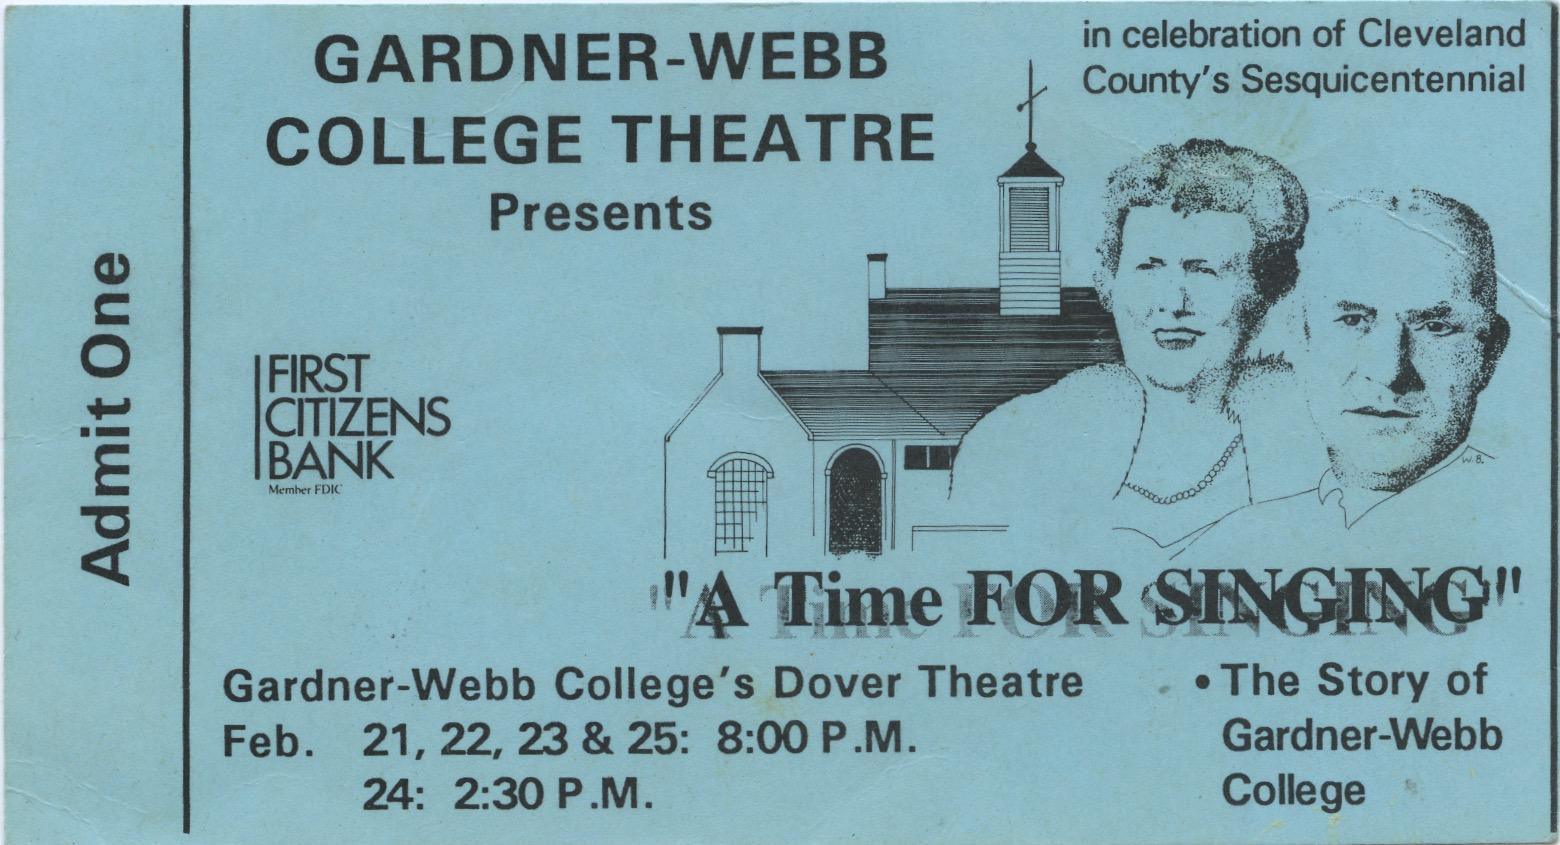 GW College Theater